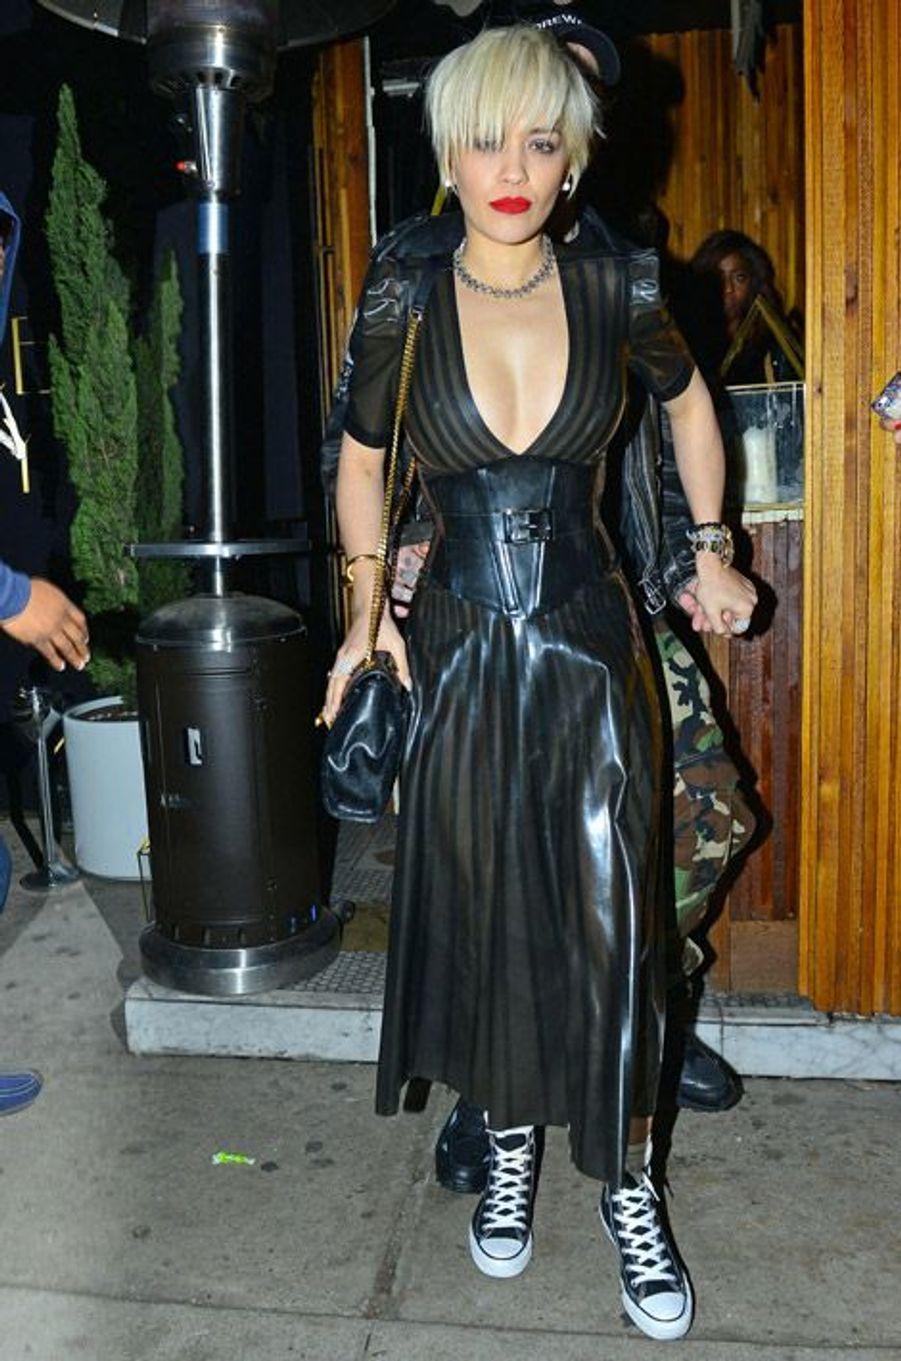 La chanteuse Rita Ora est son style sado maso